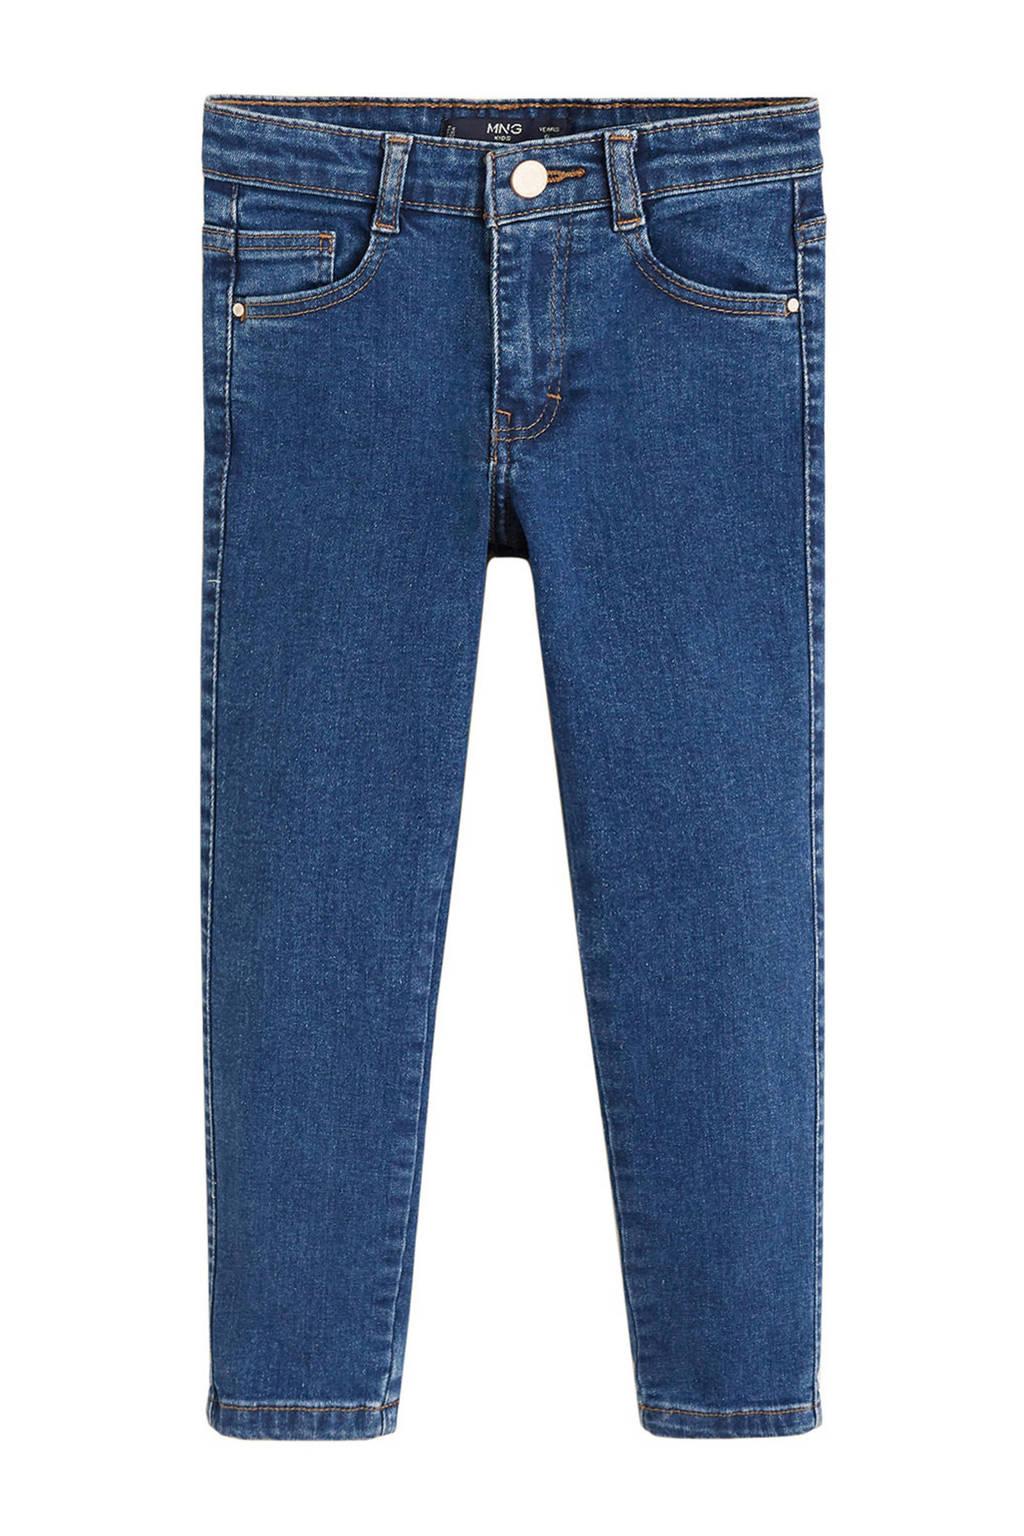 Mango Kids skinny jeans, Dark denim